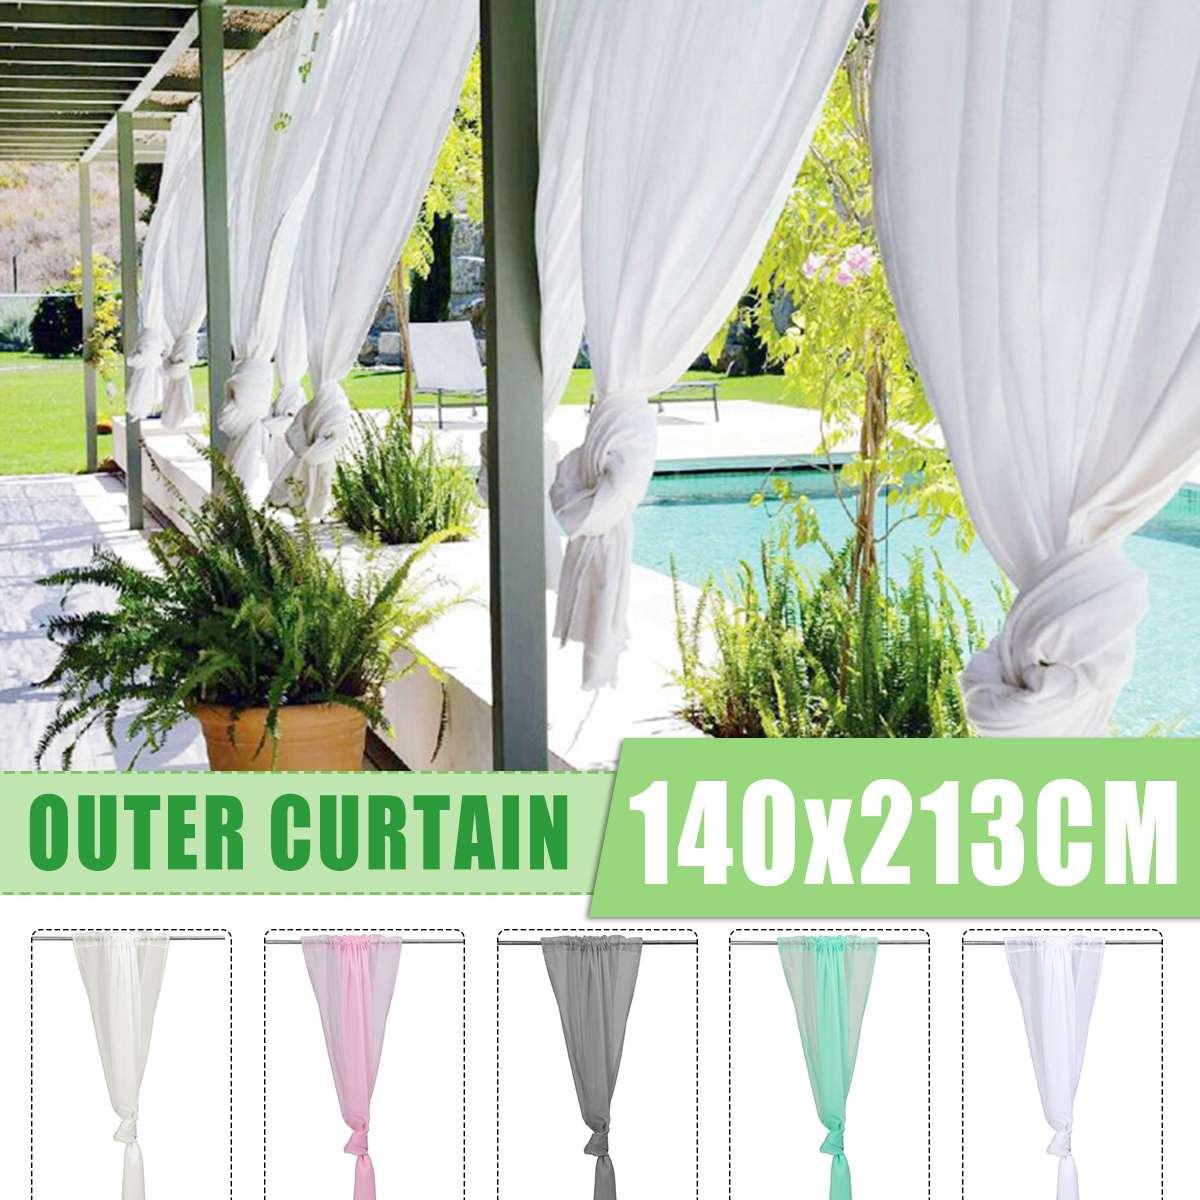 Outdoor Curtain Panel Wedding Garden Party Waterproof Polyester White Drape